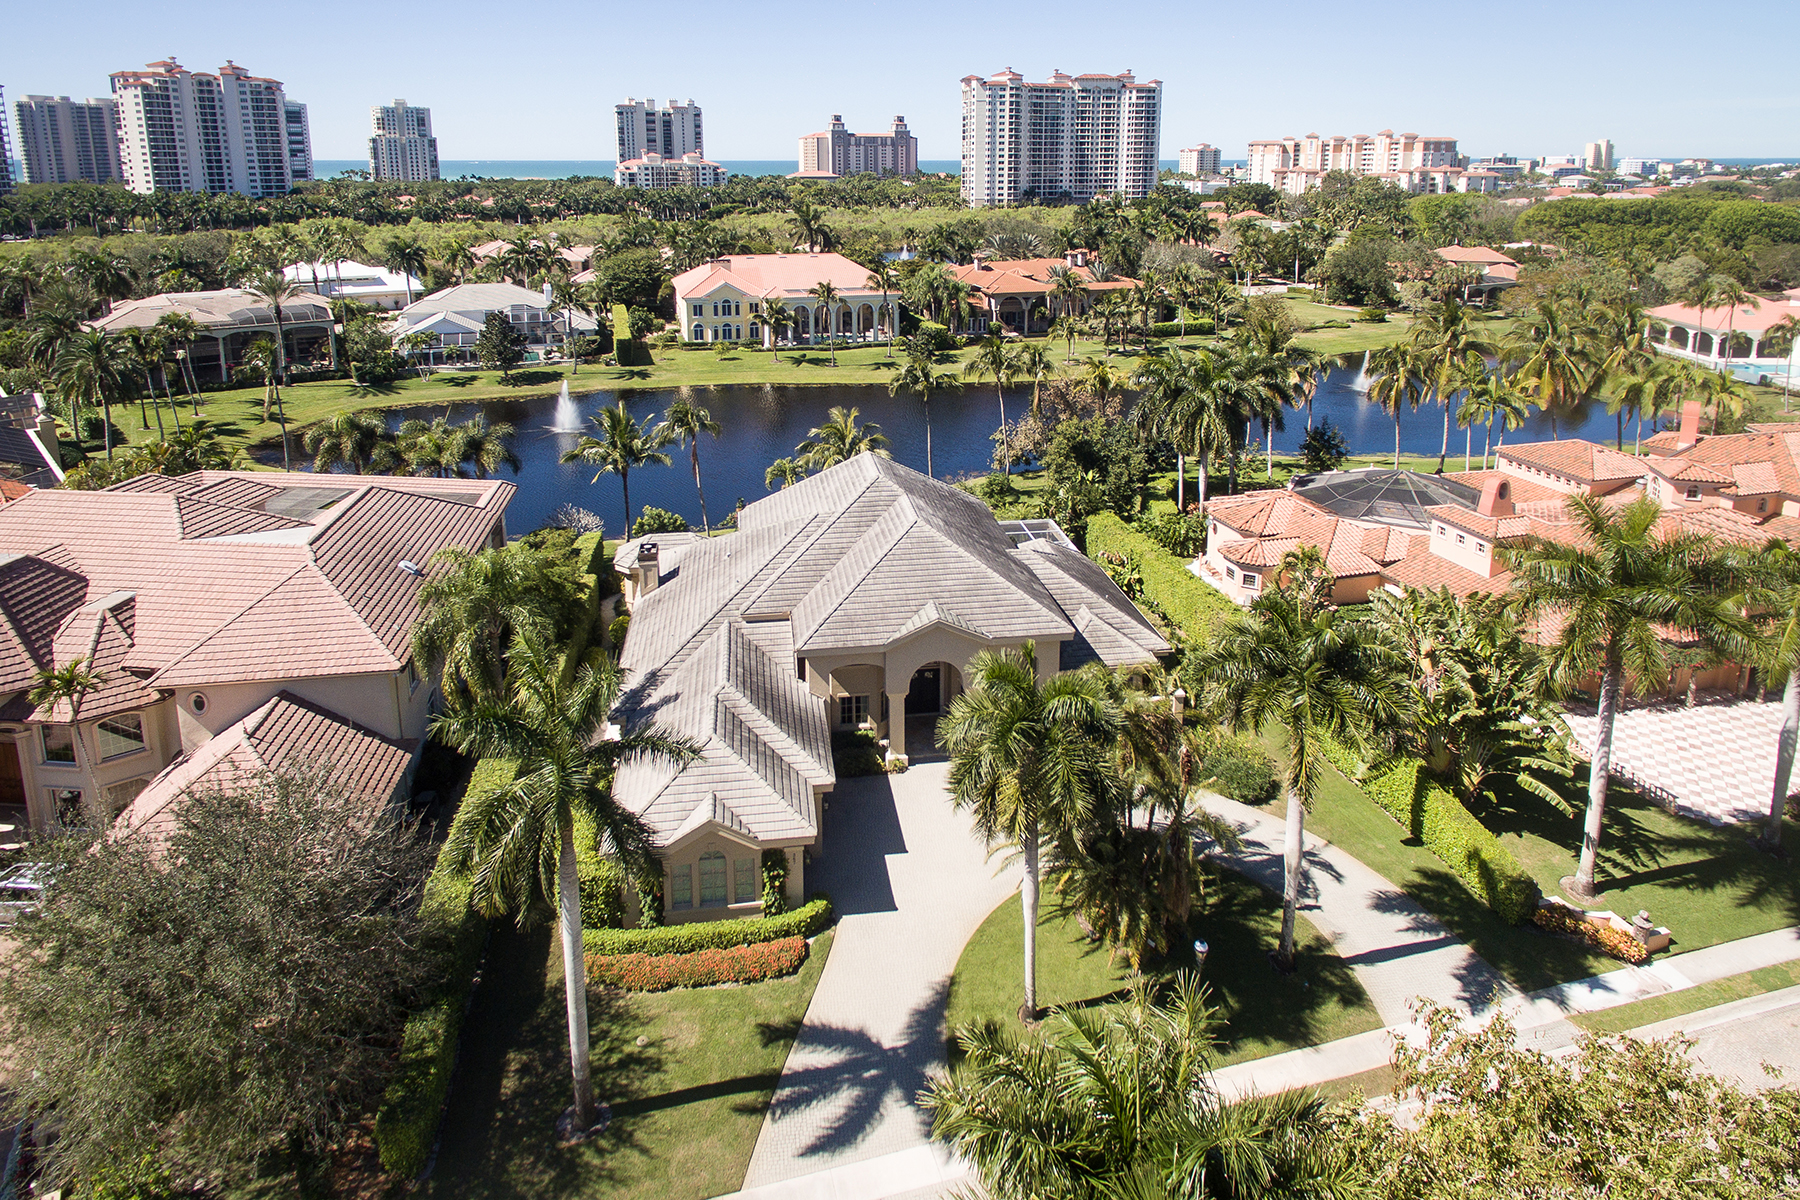 Moradia para Venda às PELICAN BAY - BAY COLONY SHORES 367 Colony Dr Naples, Florida, 34108 Estados Unidos